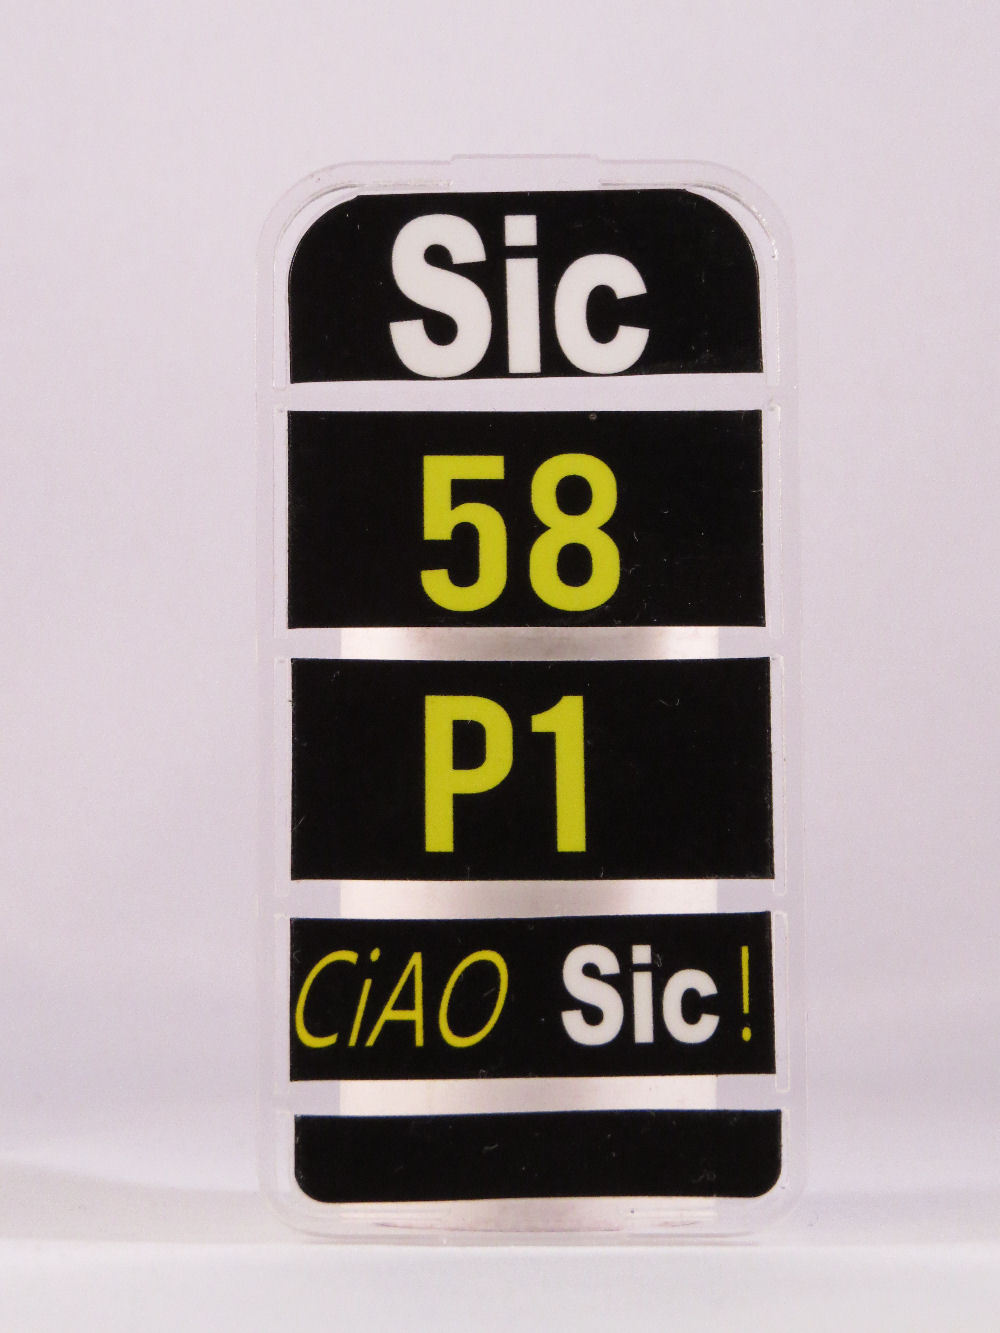 MINICHAMPS MARCO SIMONCELLI PITBOARDS MOTOGP SCALA 1/12 CIAO SIC NEW